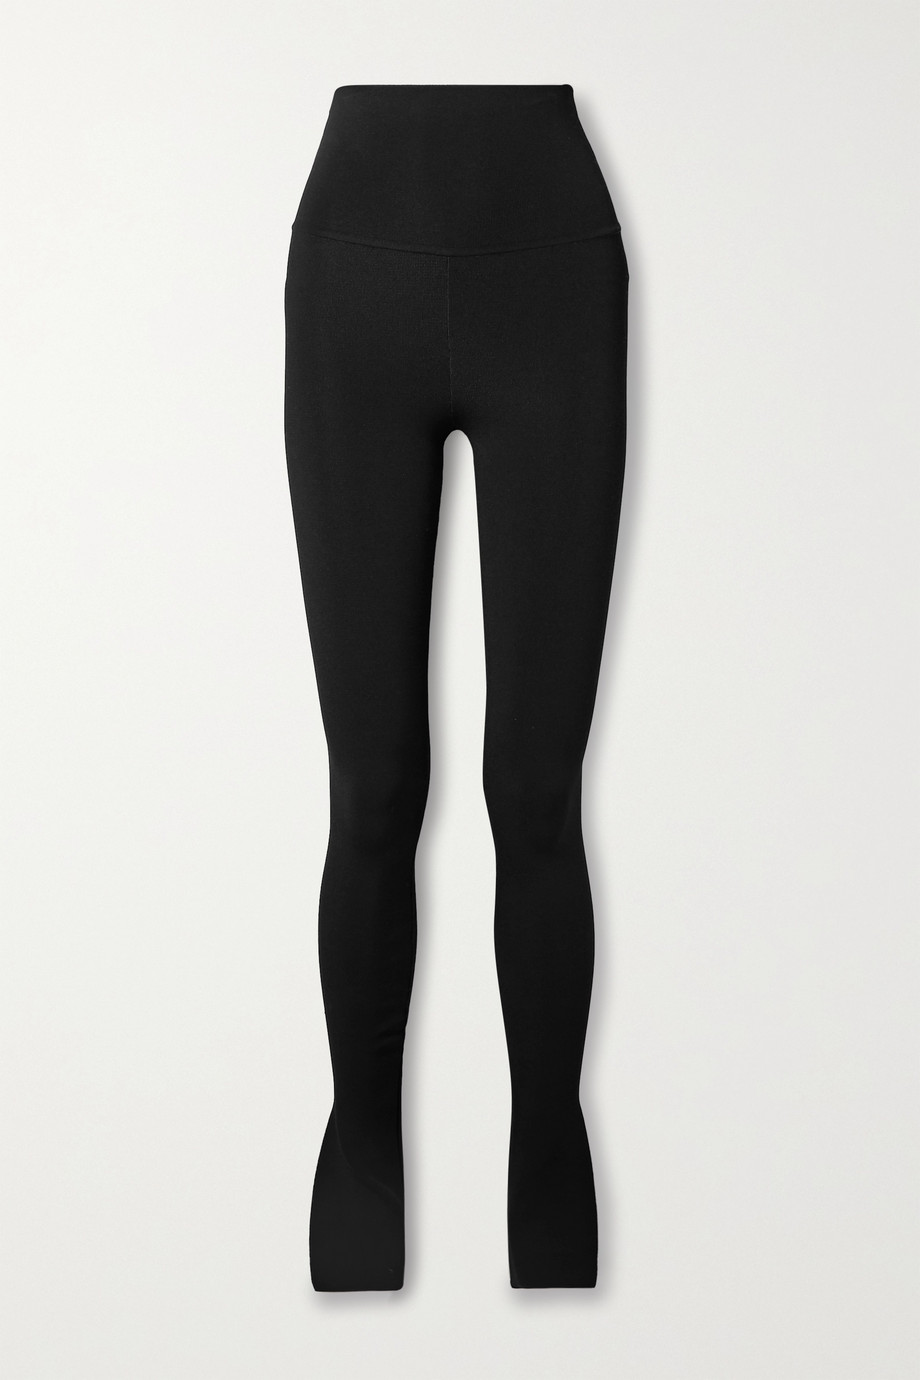 Khaite Roonie stretch-knit skinny pants